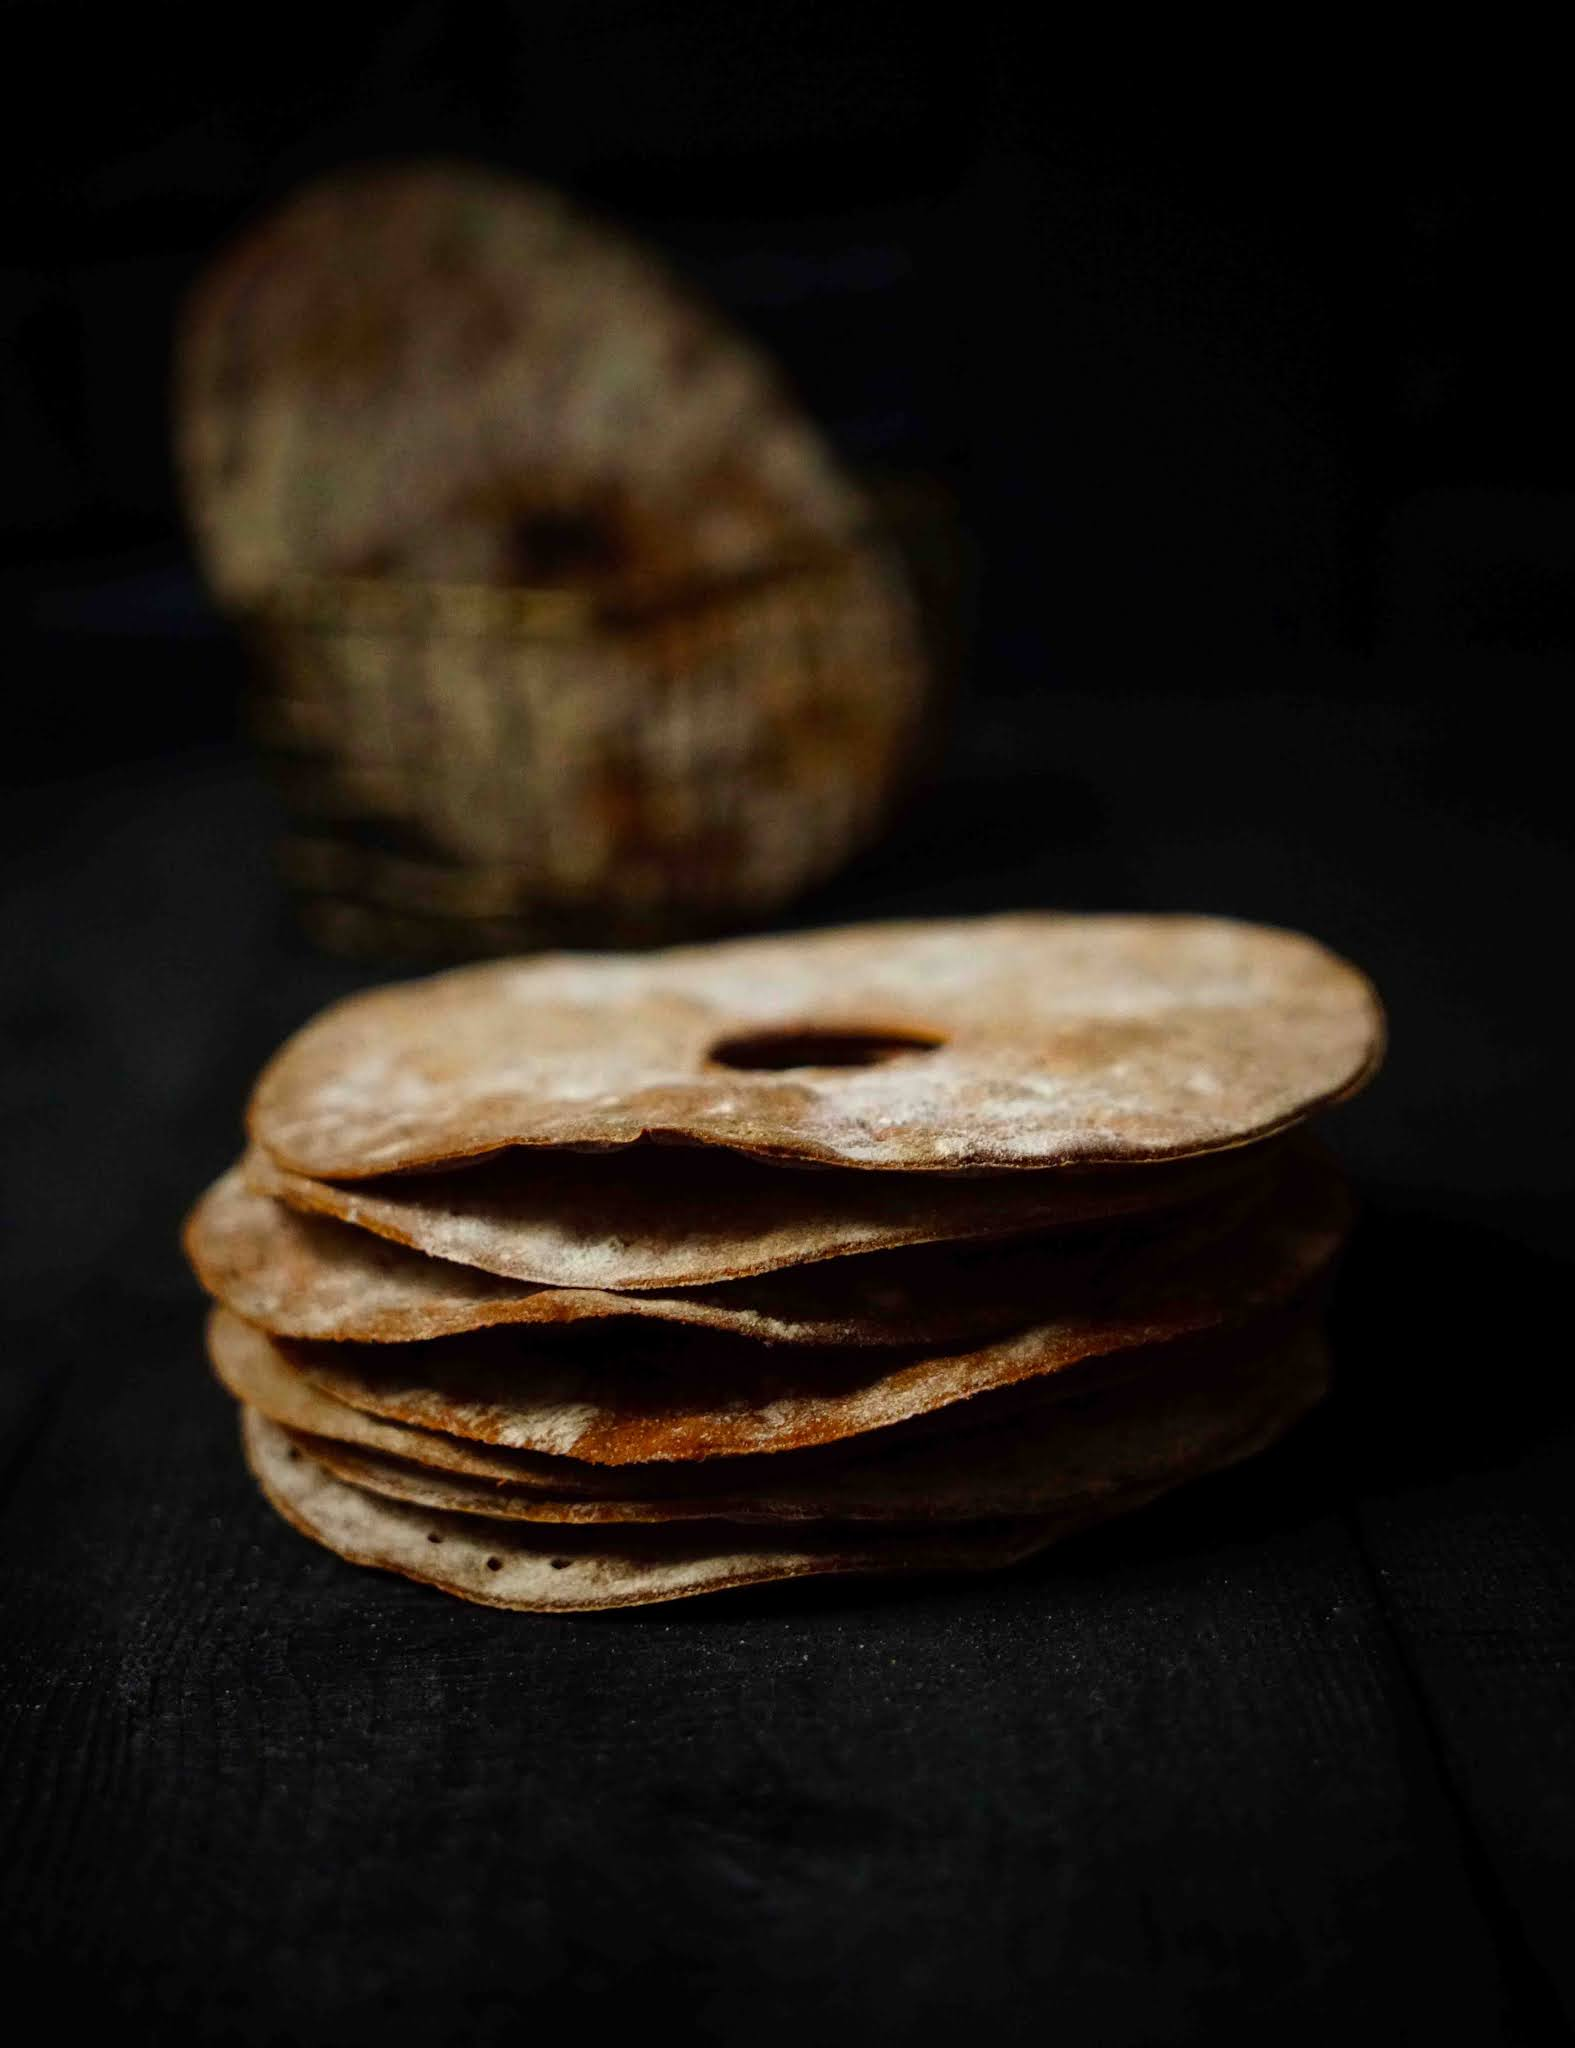 recette suédoise , farine de seigle , waza